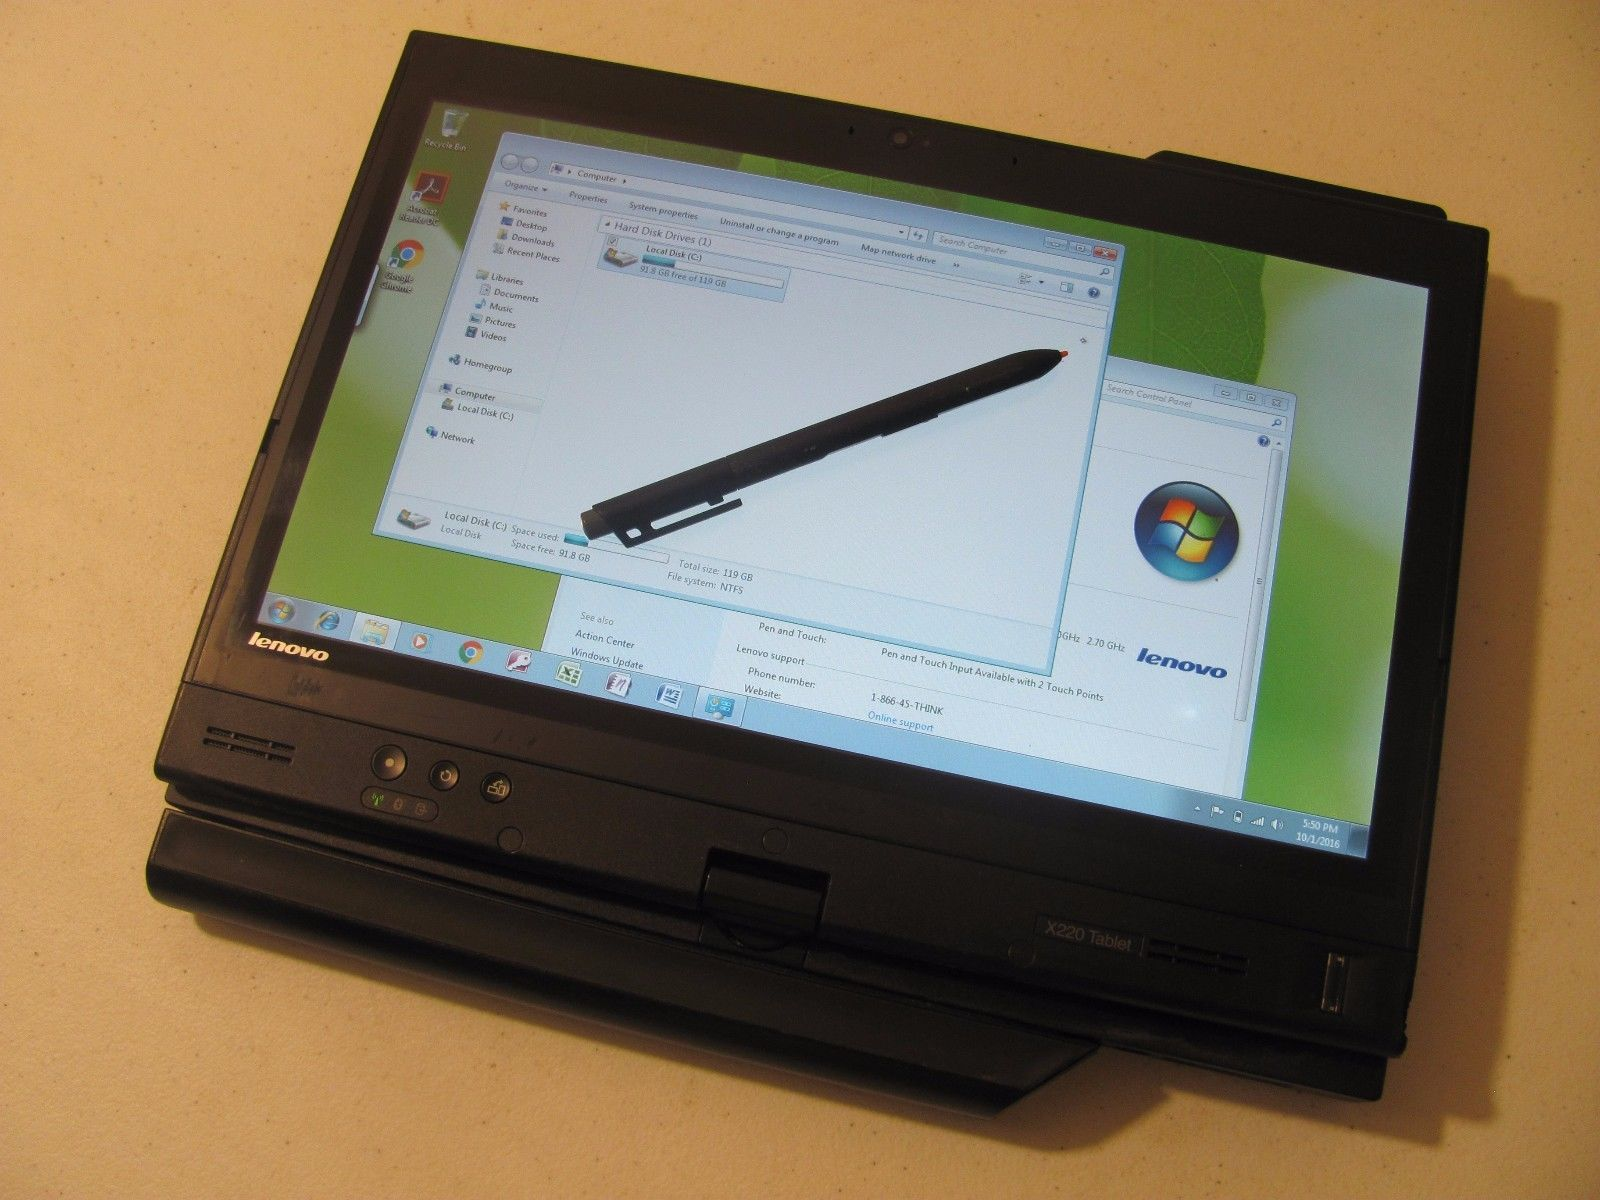 0bfebd79292a Lenovo ThinkPad X220 Tablet Core i7 2.70GHz 8 GB 128 GB SSD Win 7 ...